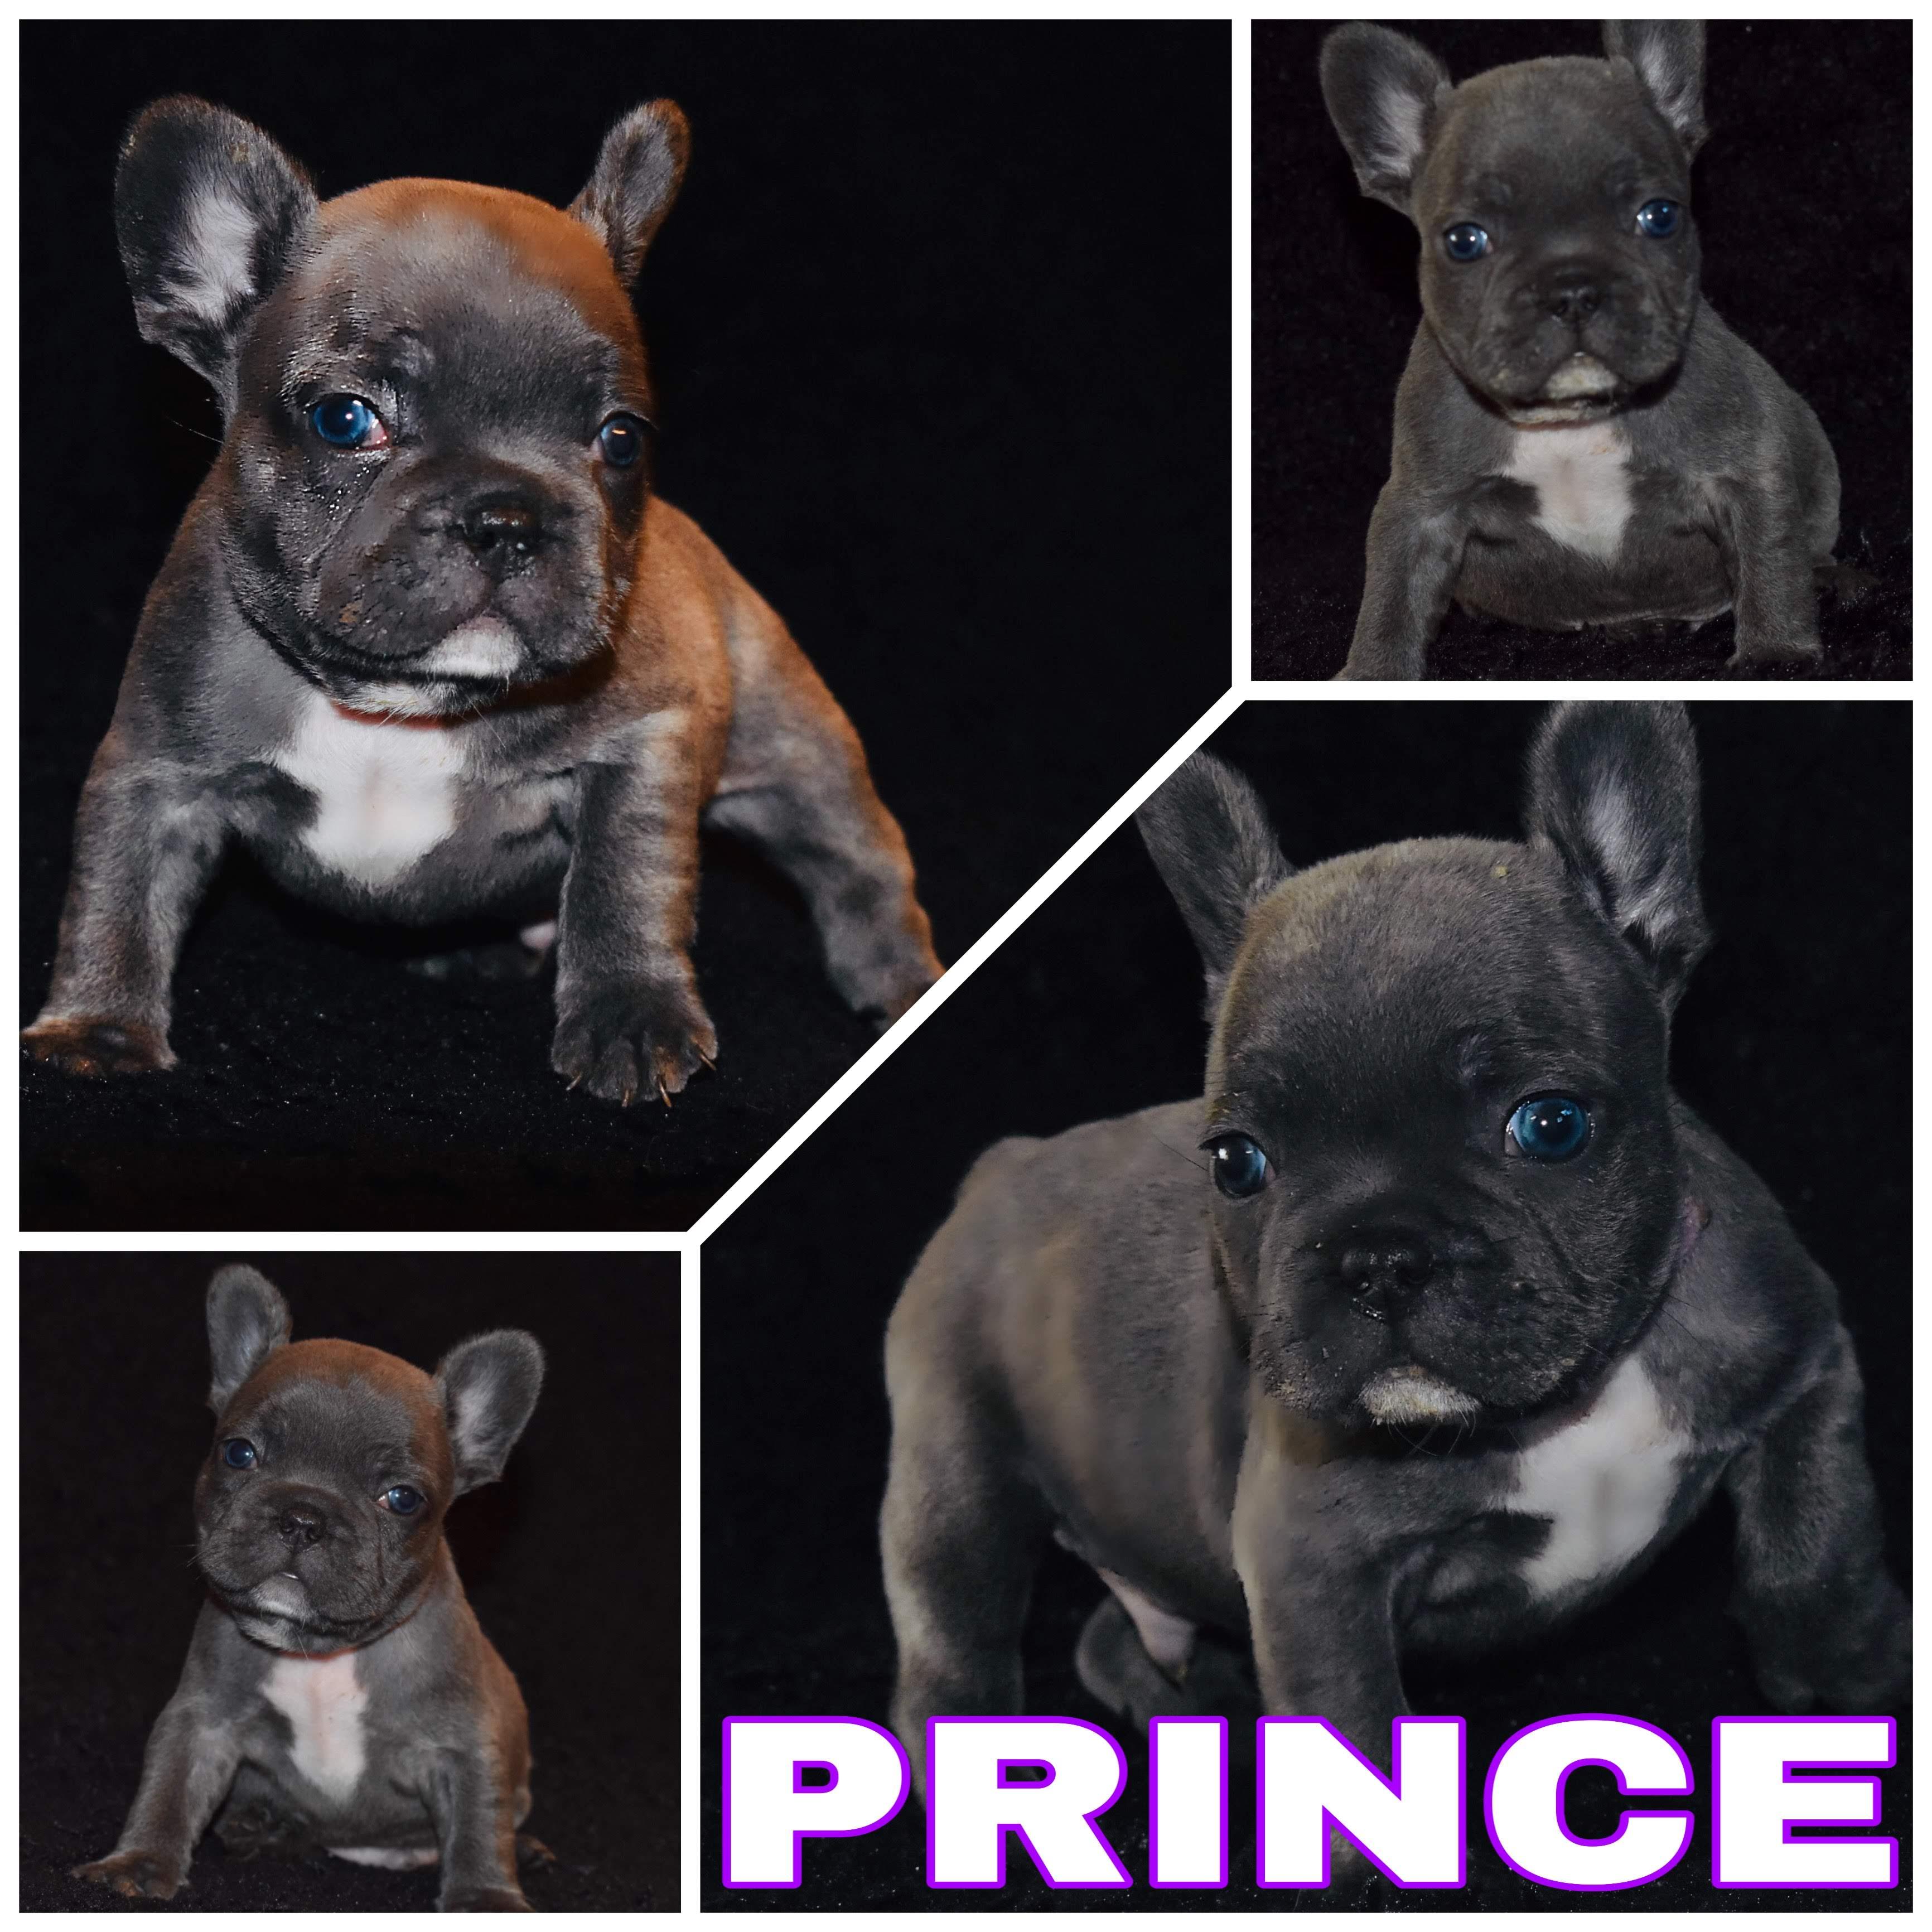 Prince - a male French Bulldog born near Houston,Texas